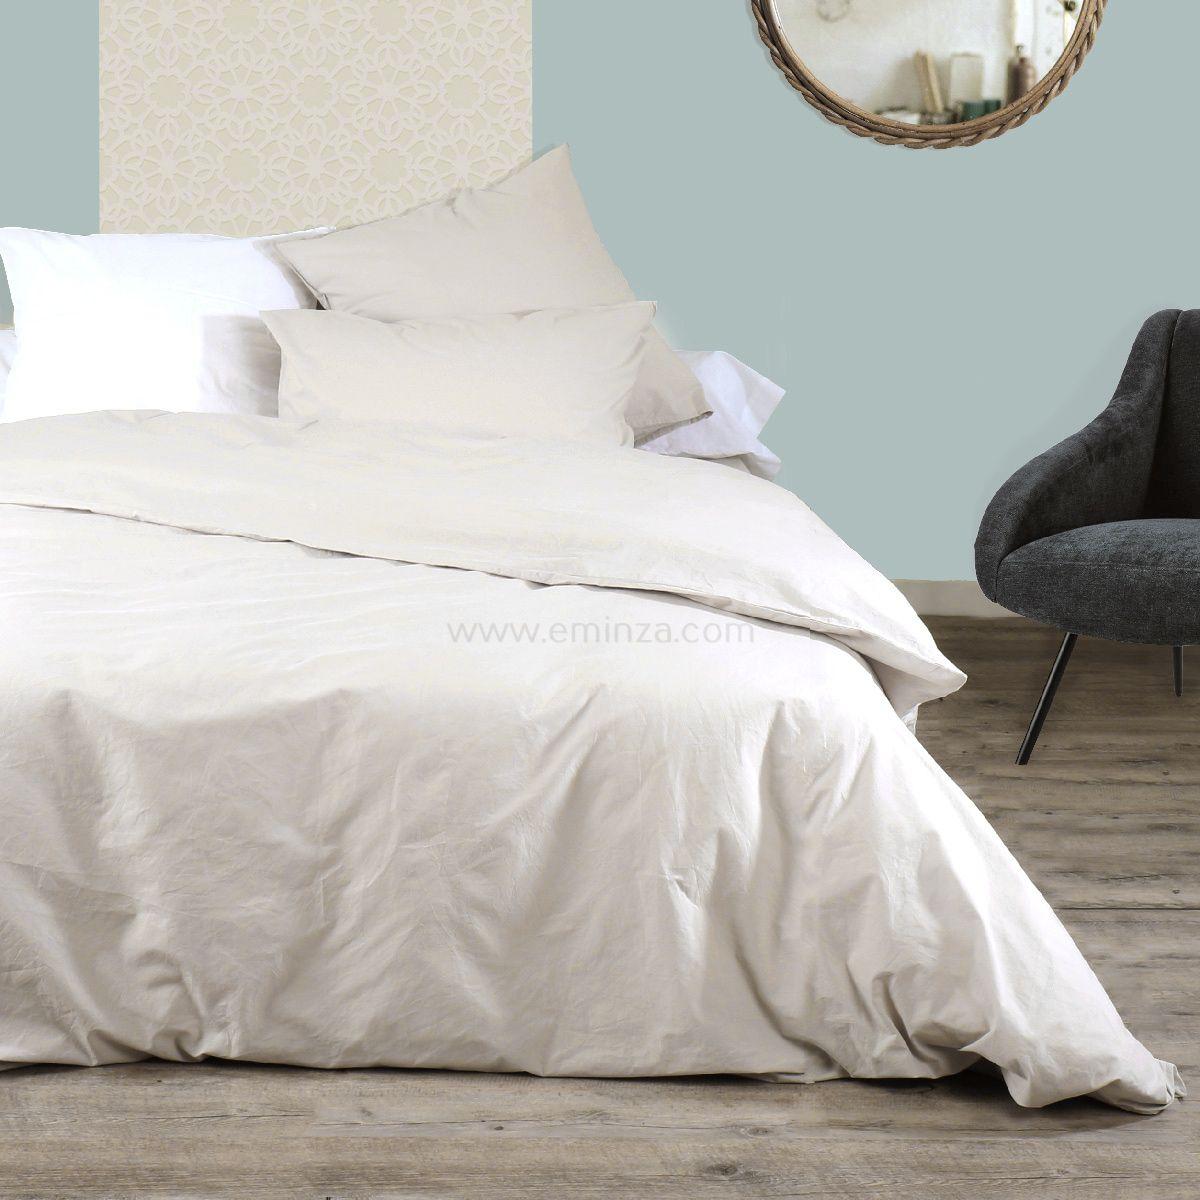 taie de traversin coton teint lav royaume lin taie d 39 oreiller traversin eminza. Black Bedroom Furniture Sets. Home Design Ideas